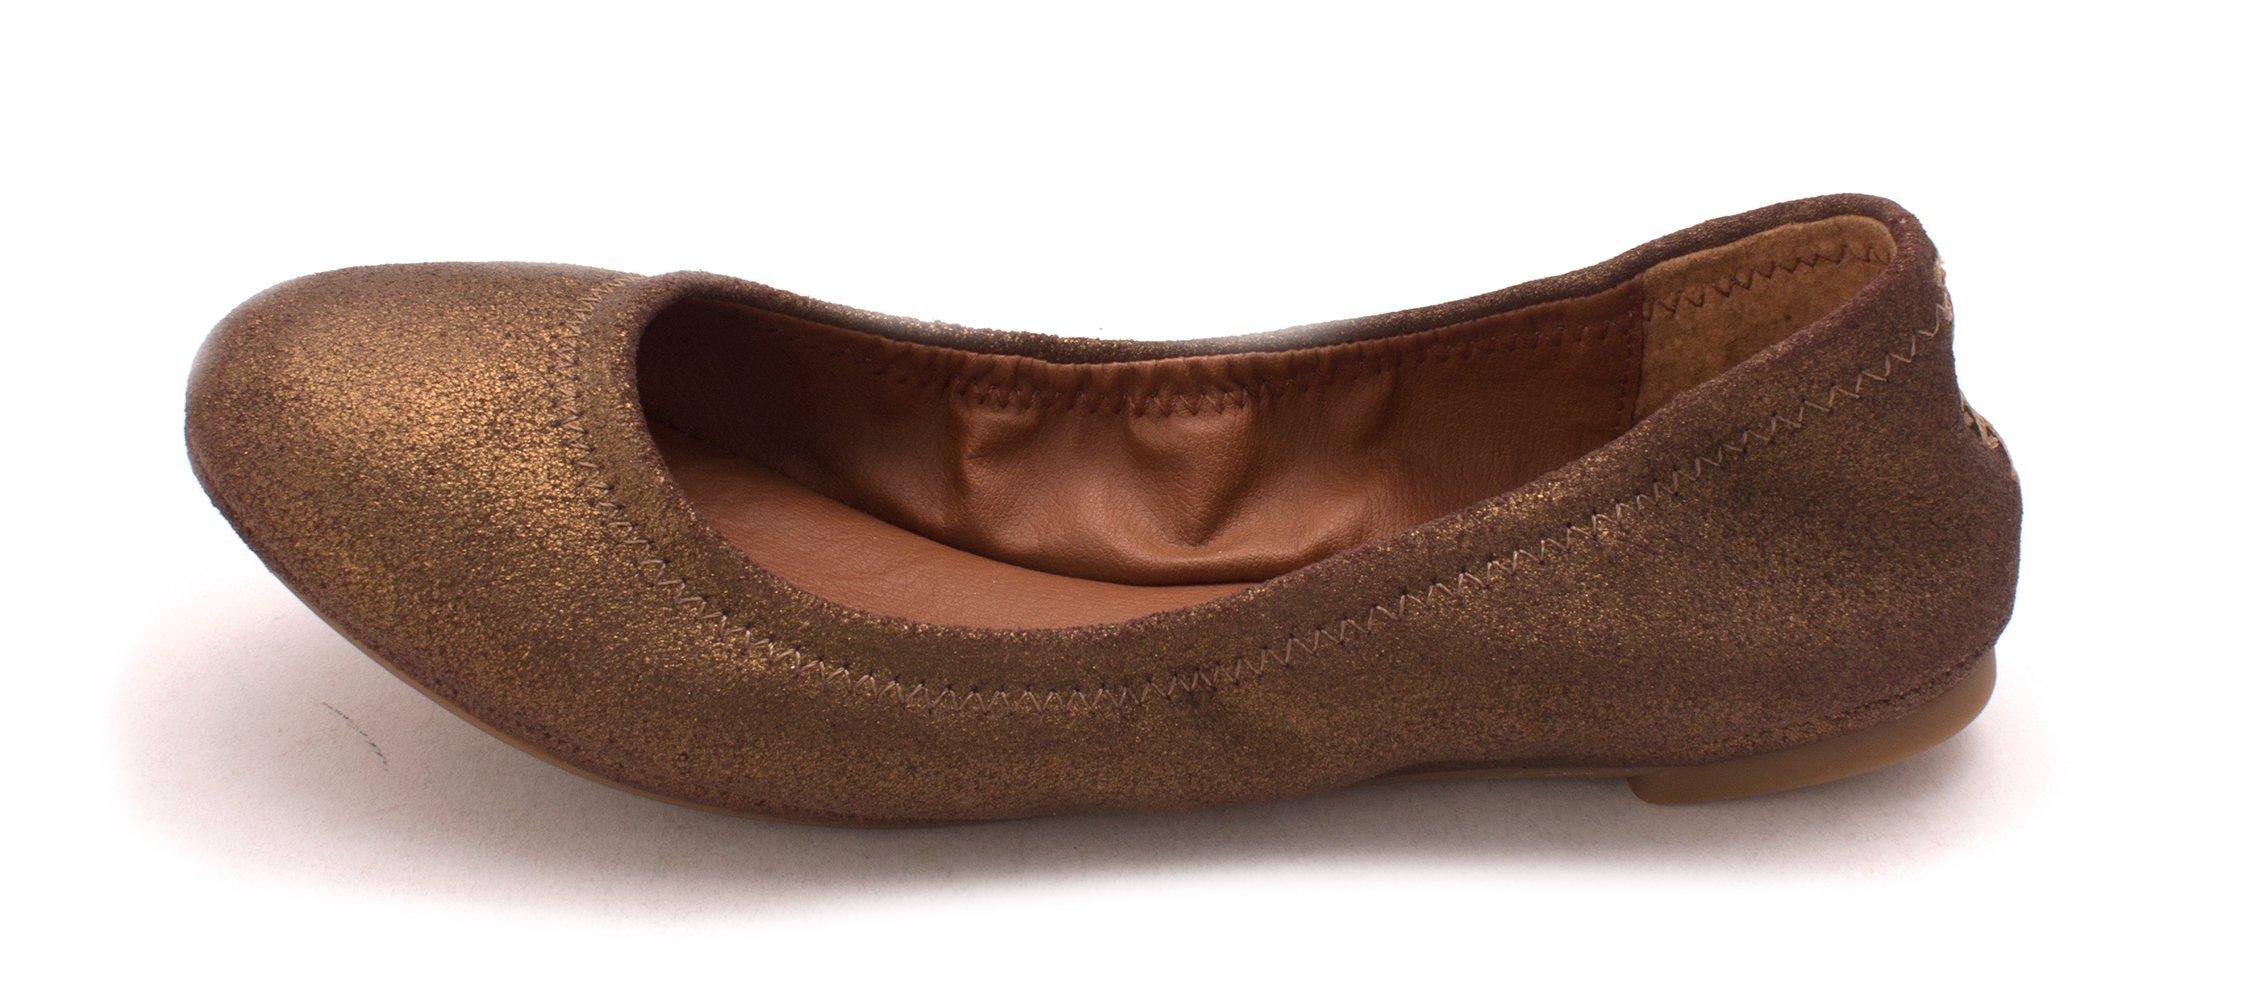 Lucky Brand Women's Bronze Powder Emmie Leather Ballet Flat Shoes